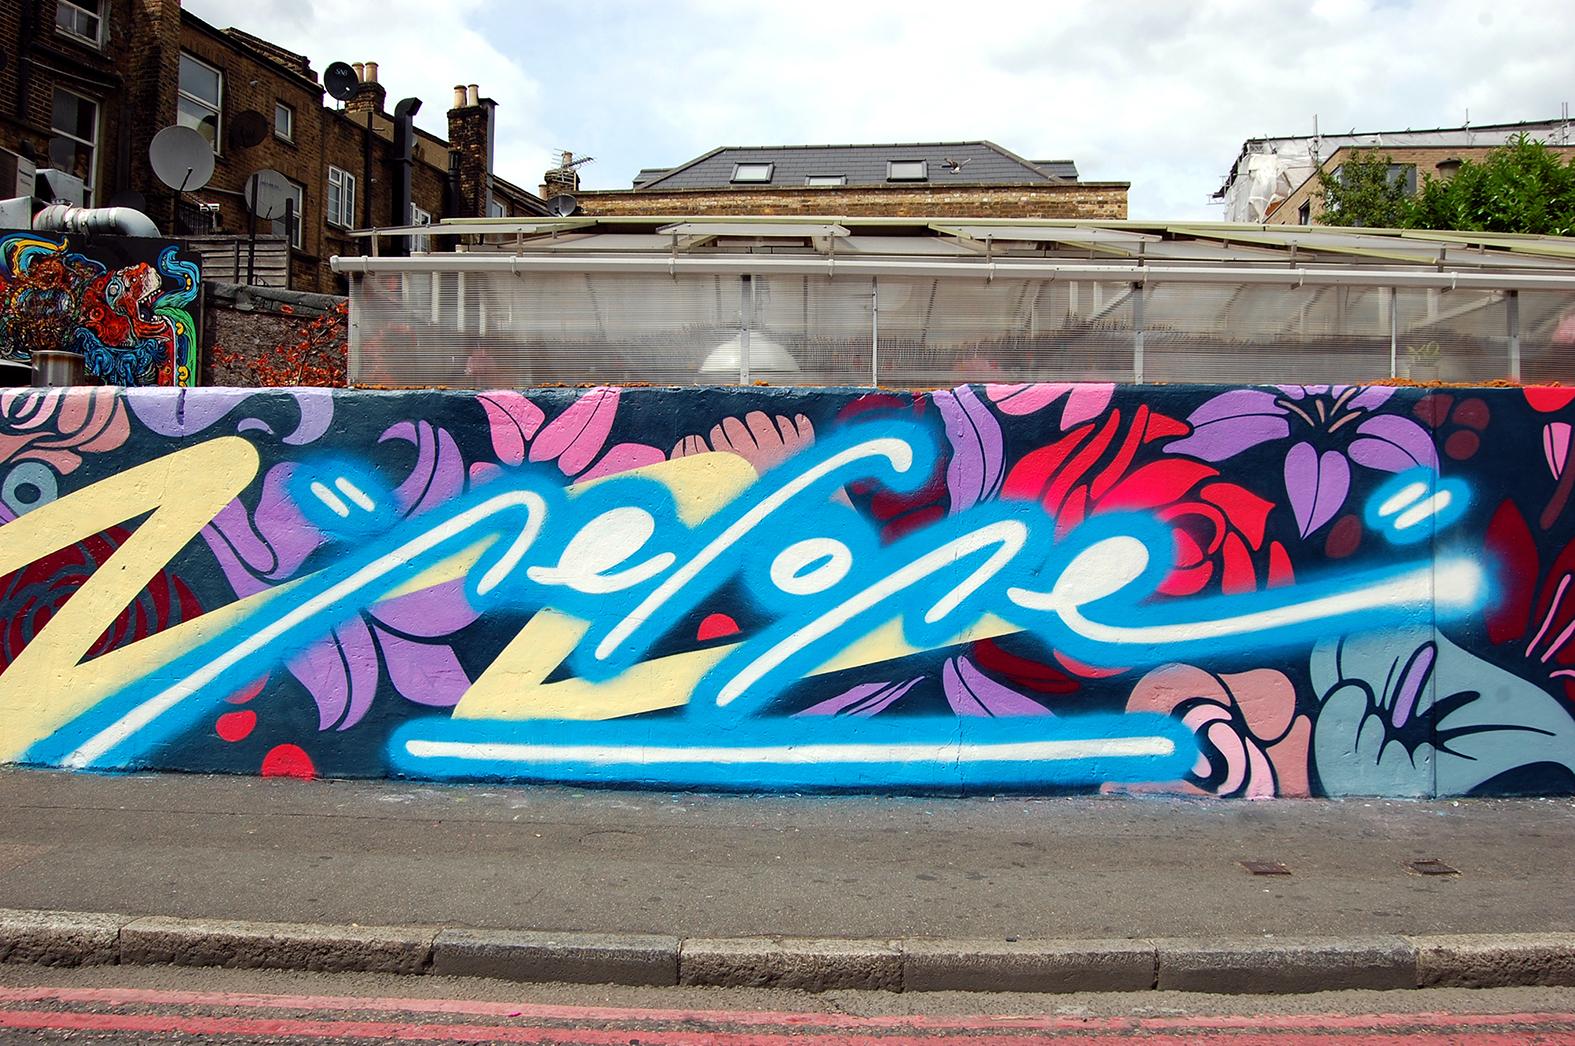 Nerone-BSMT-space-graffiti-4